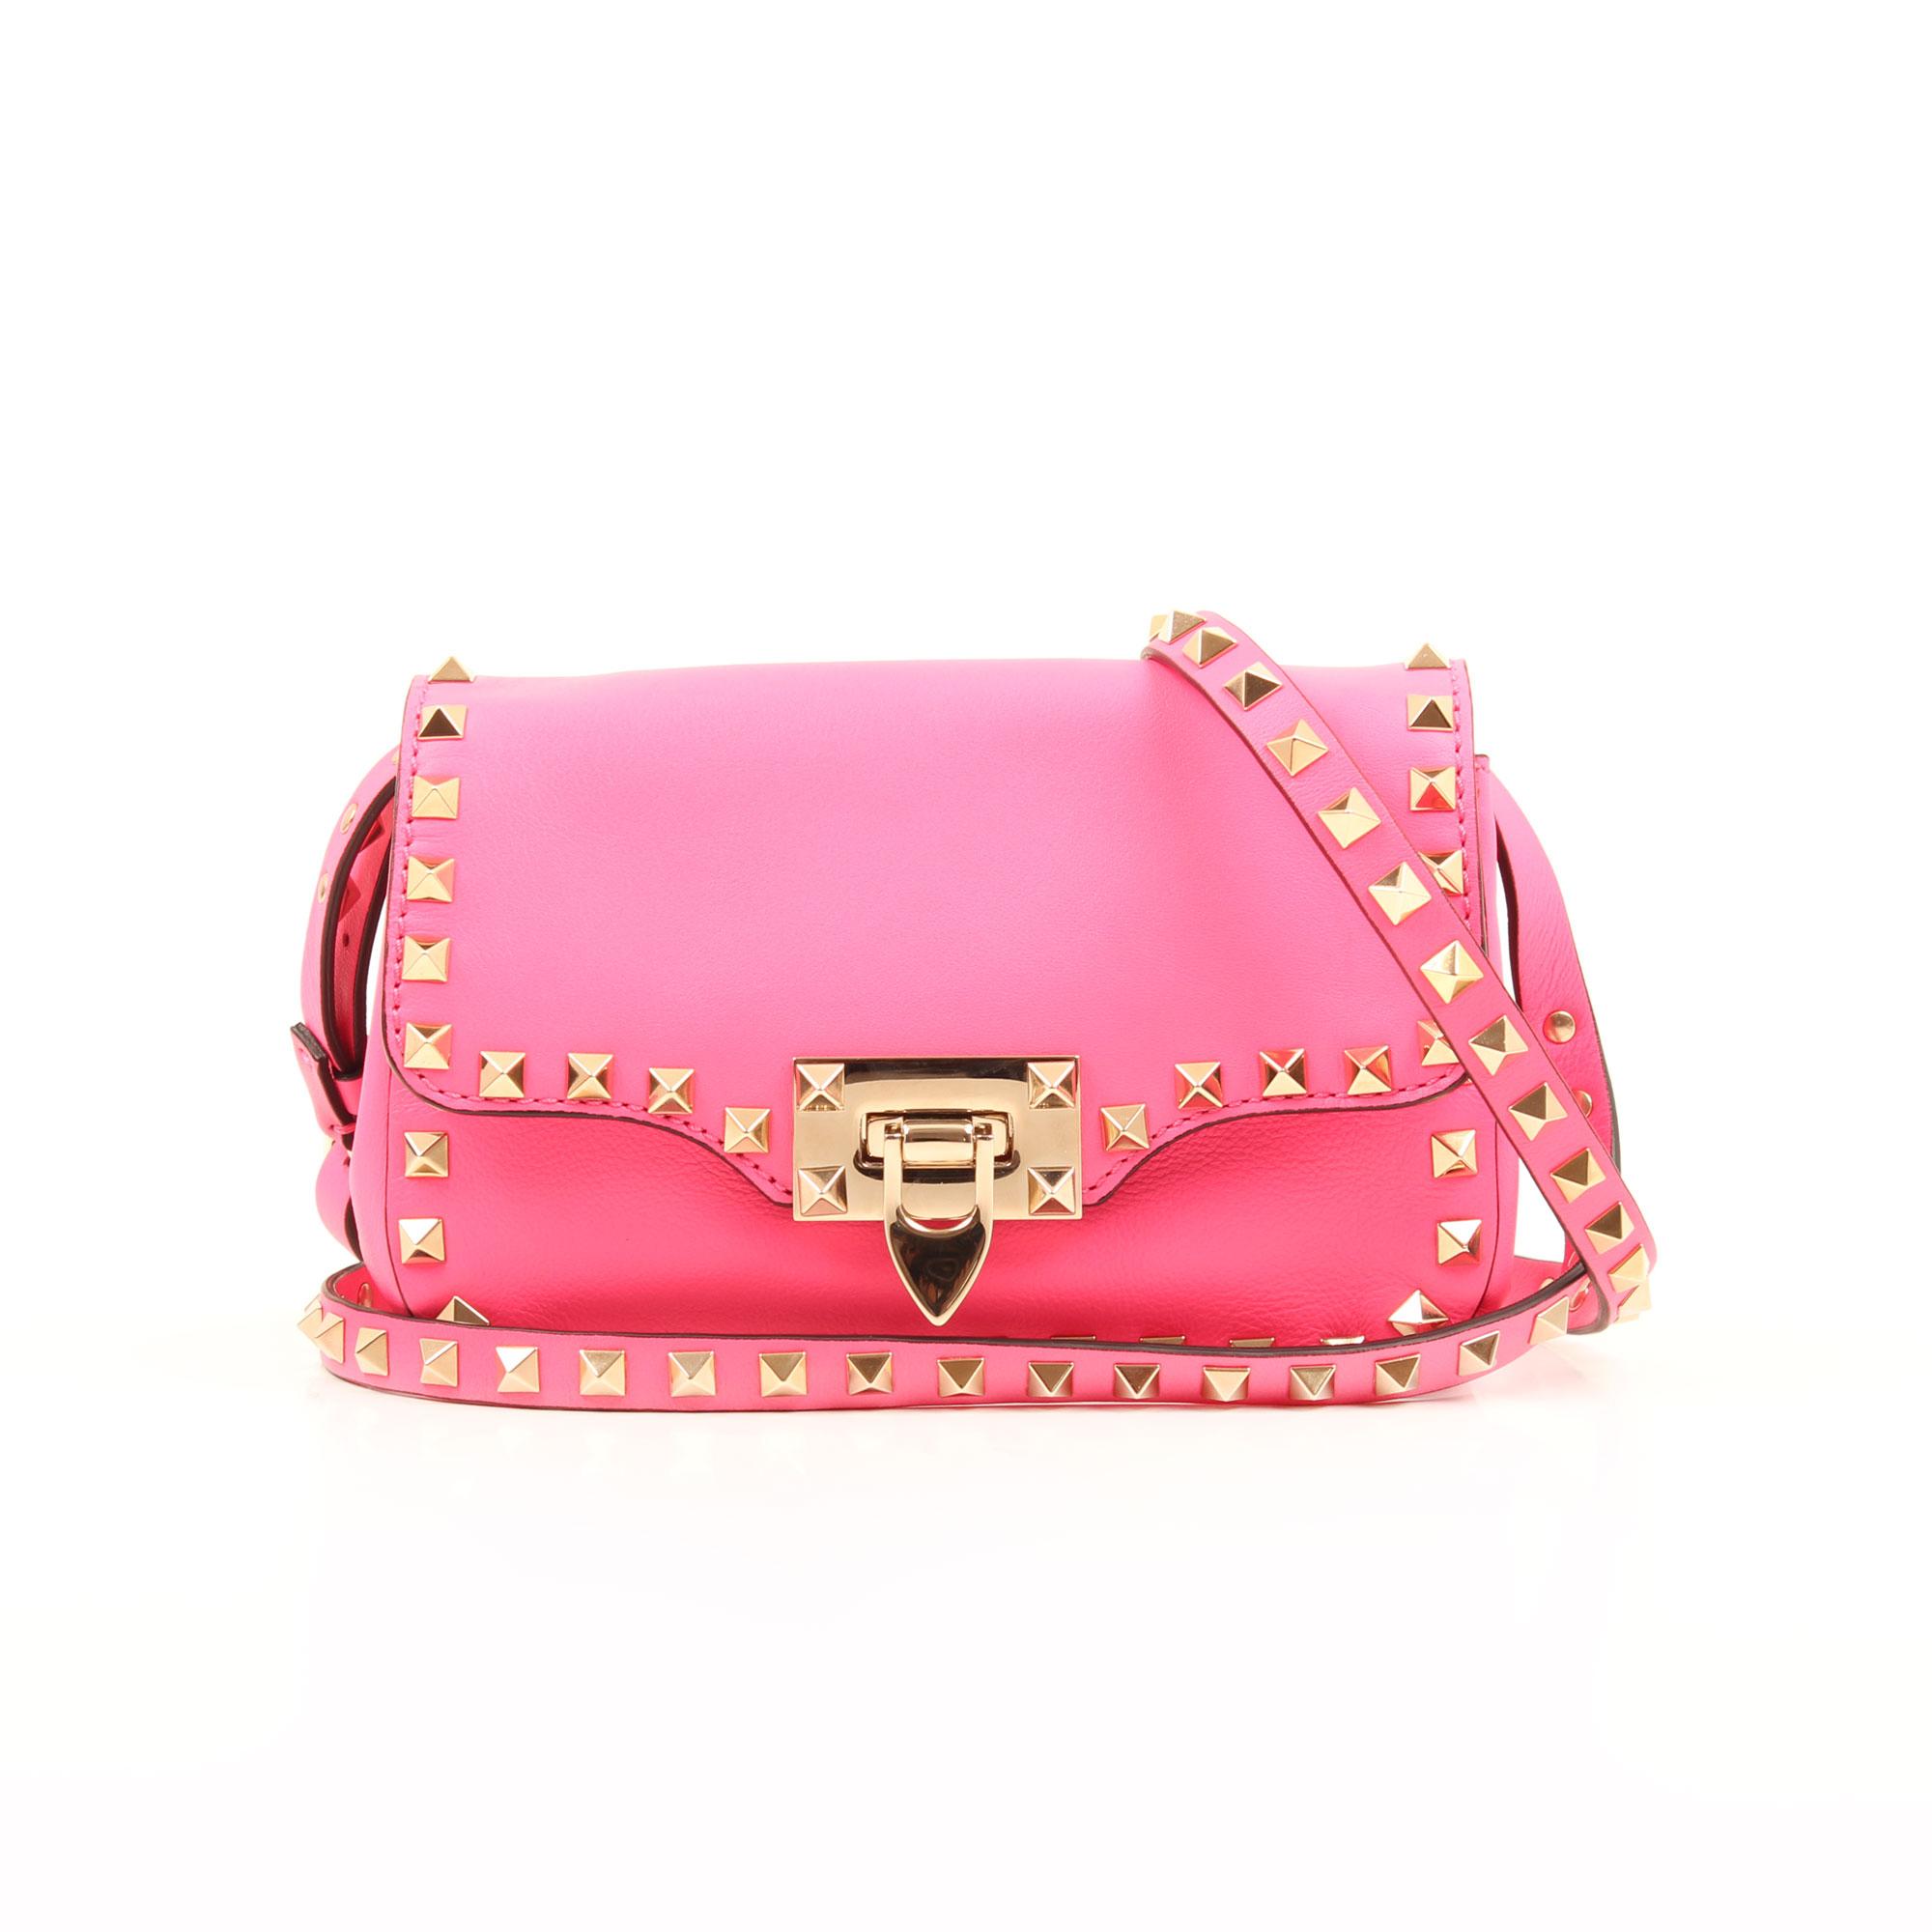 Imagen frontal del bolso valentino mini rockstud rosa